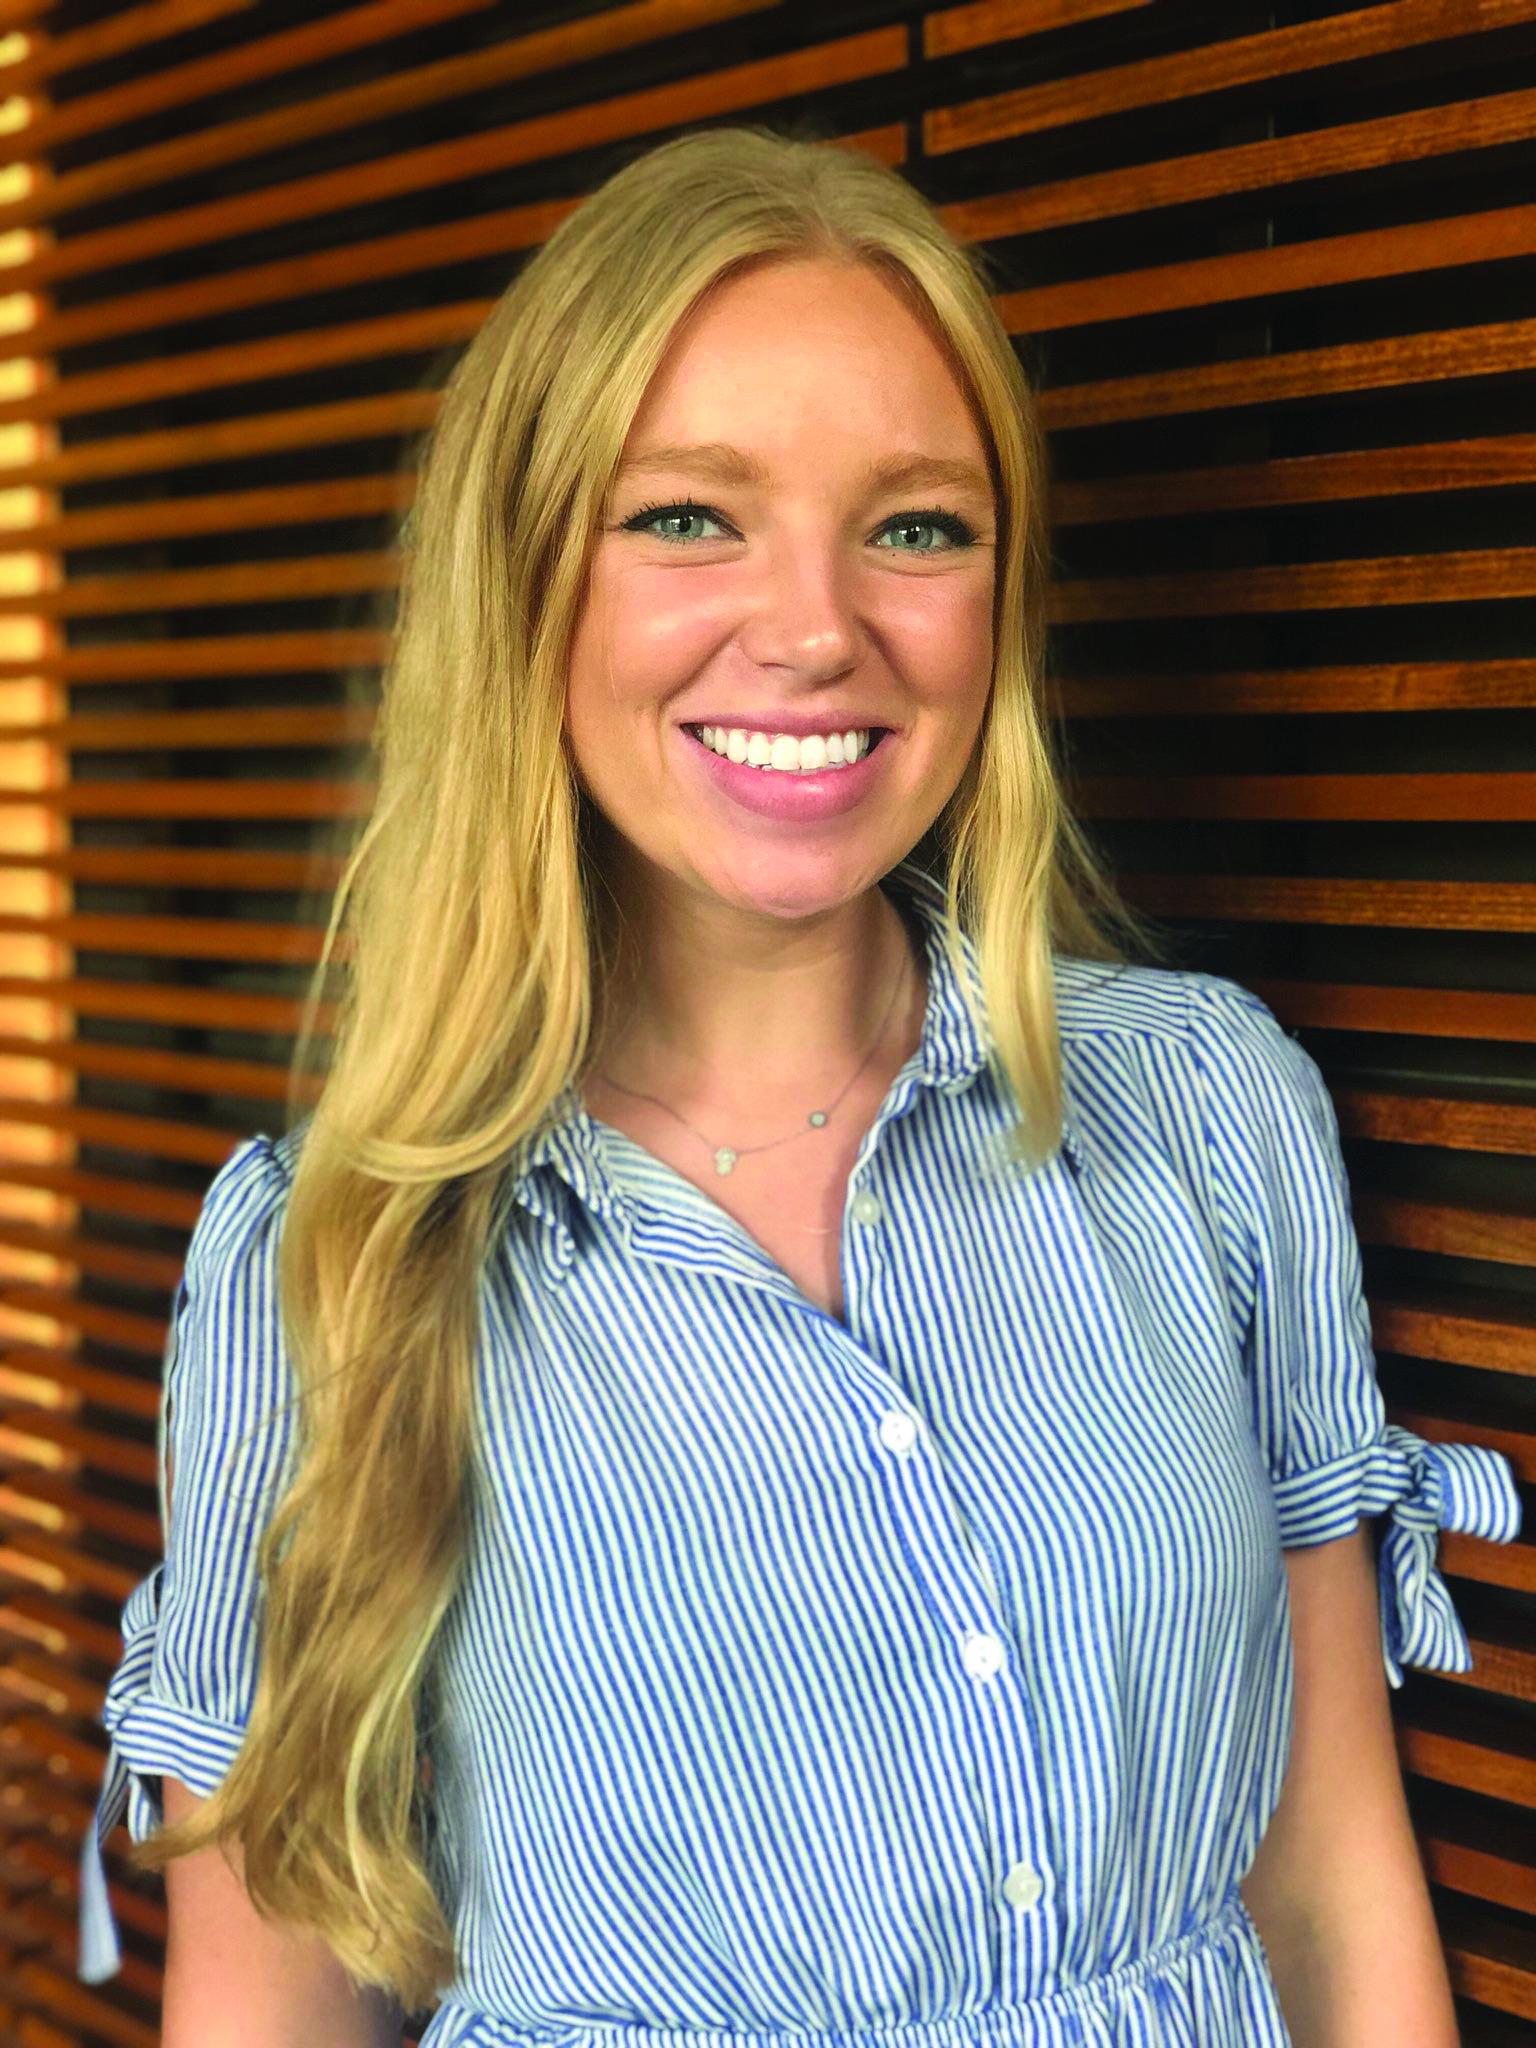 Madison Aubury Pumphrey